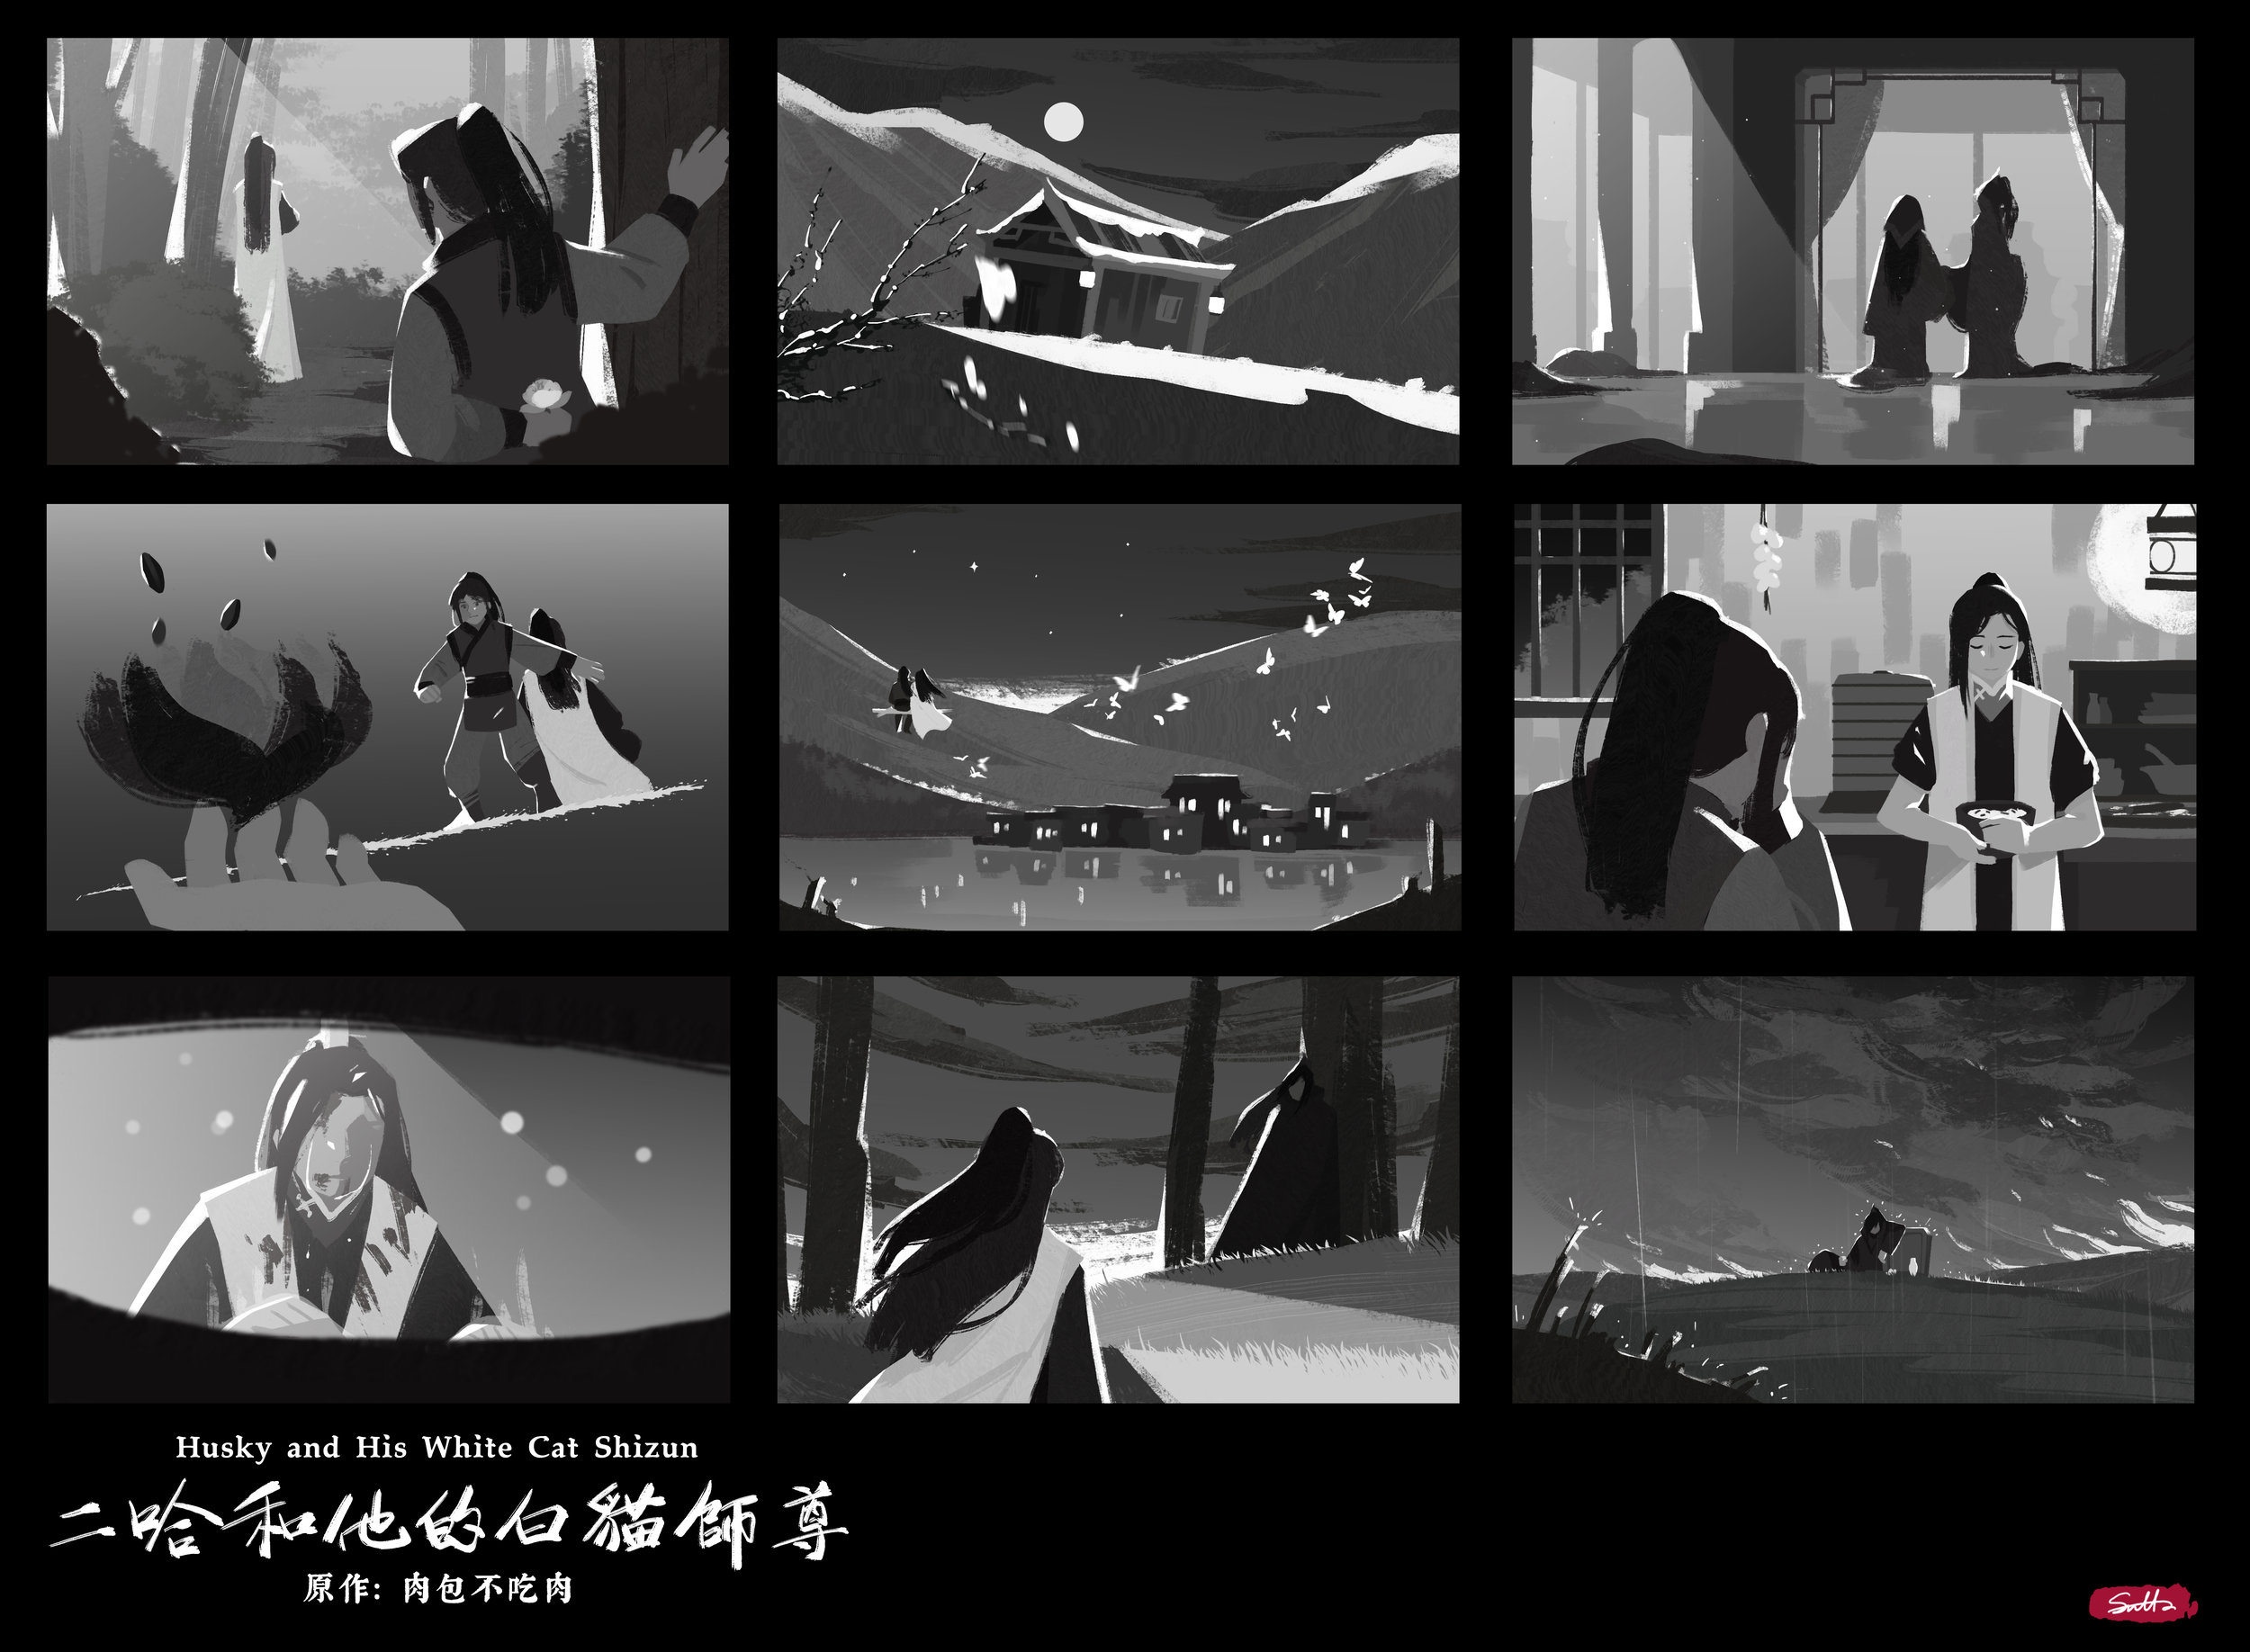 2Ha storyboard.jpg